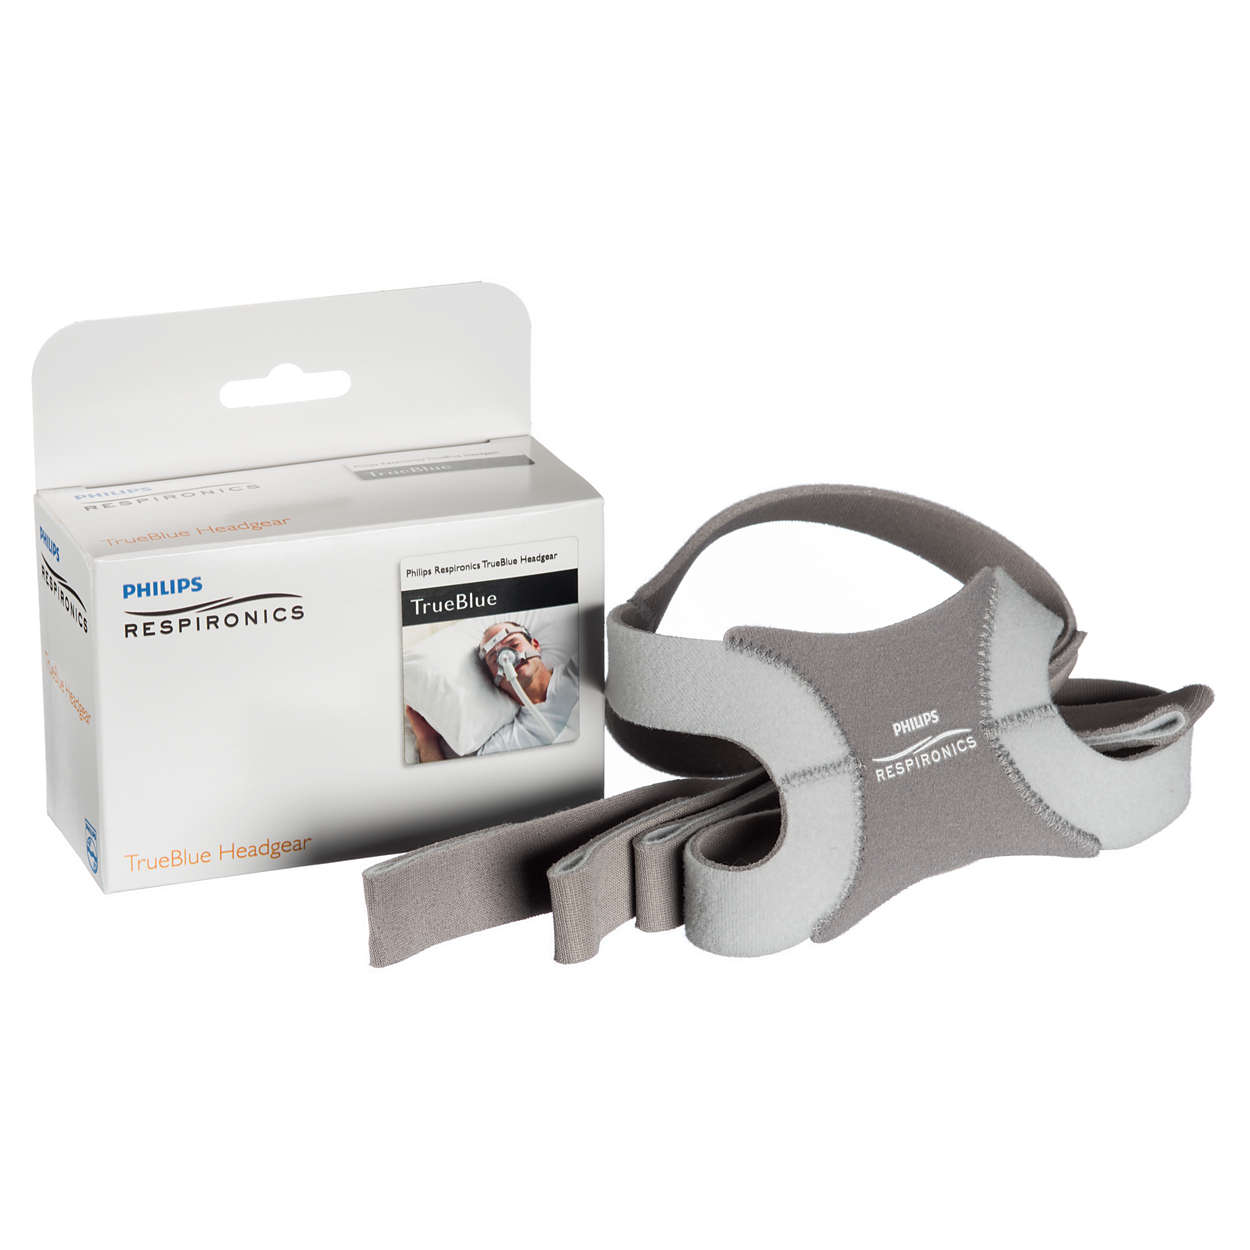 TrueBlue-hodestroppen har integrerte justerbare stropper